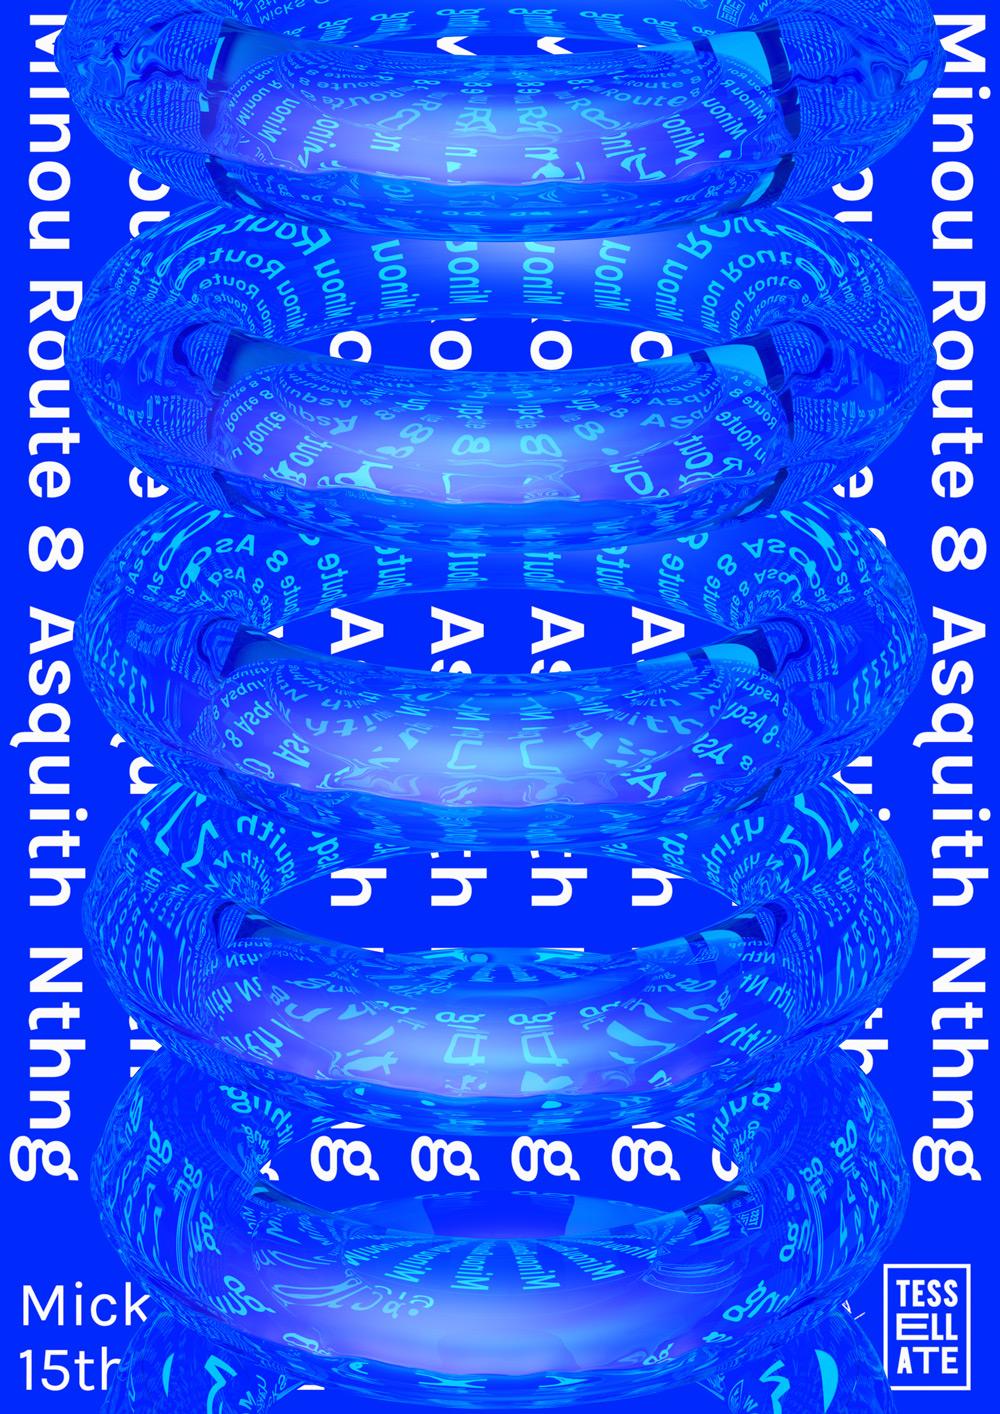 09-Tobias-Raschbacher-Tessellate-Poster